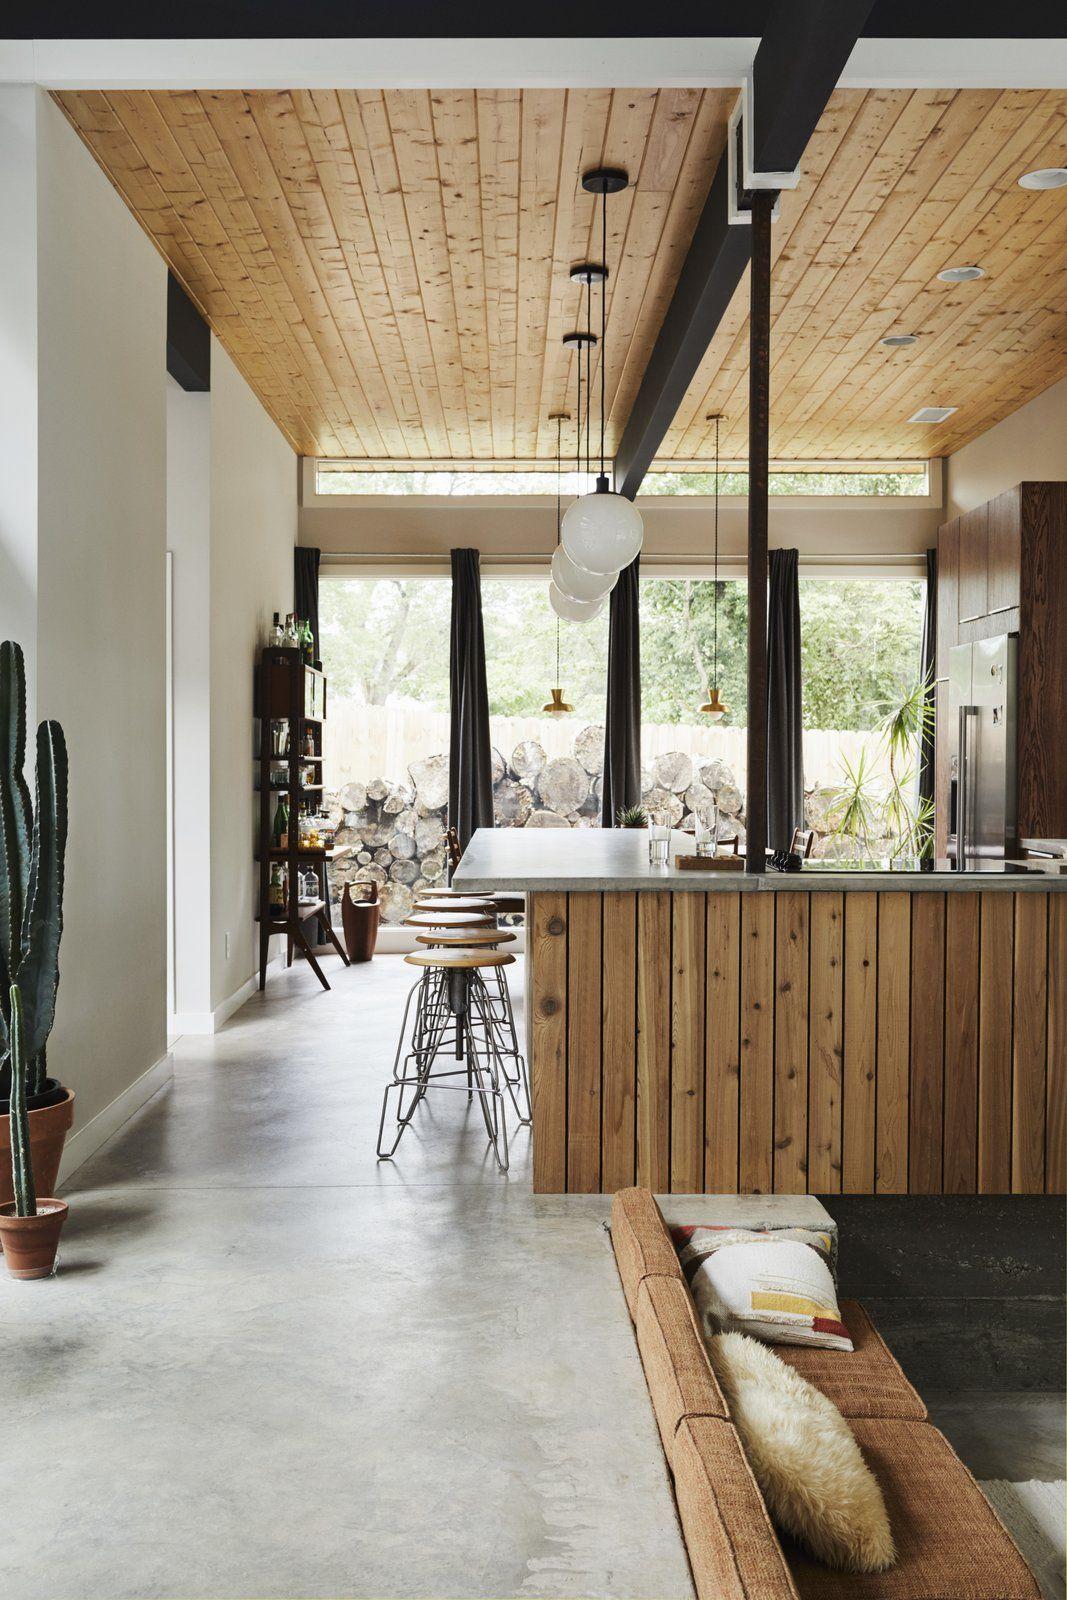 A Self Taught Designer Builds A Midcentury Inspired Home On A Budget Sunken Living Room Home Kitchen Inspiration Modern